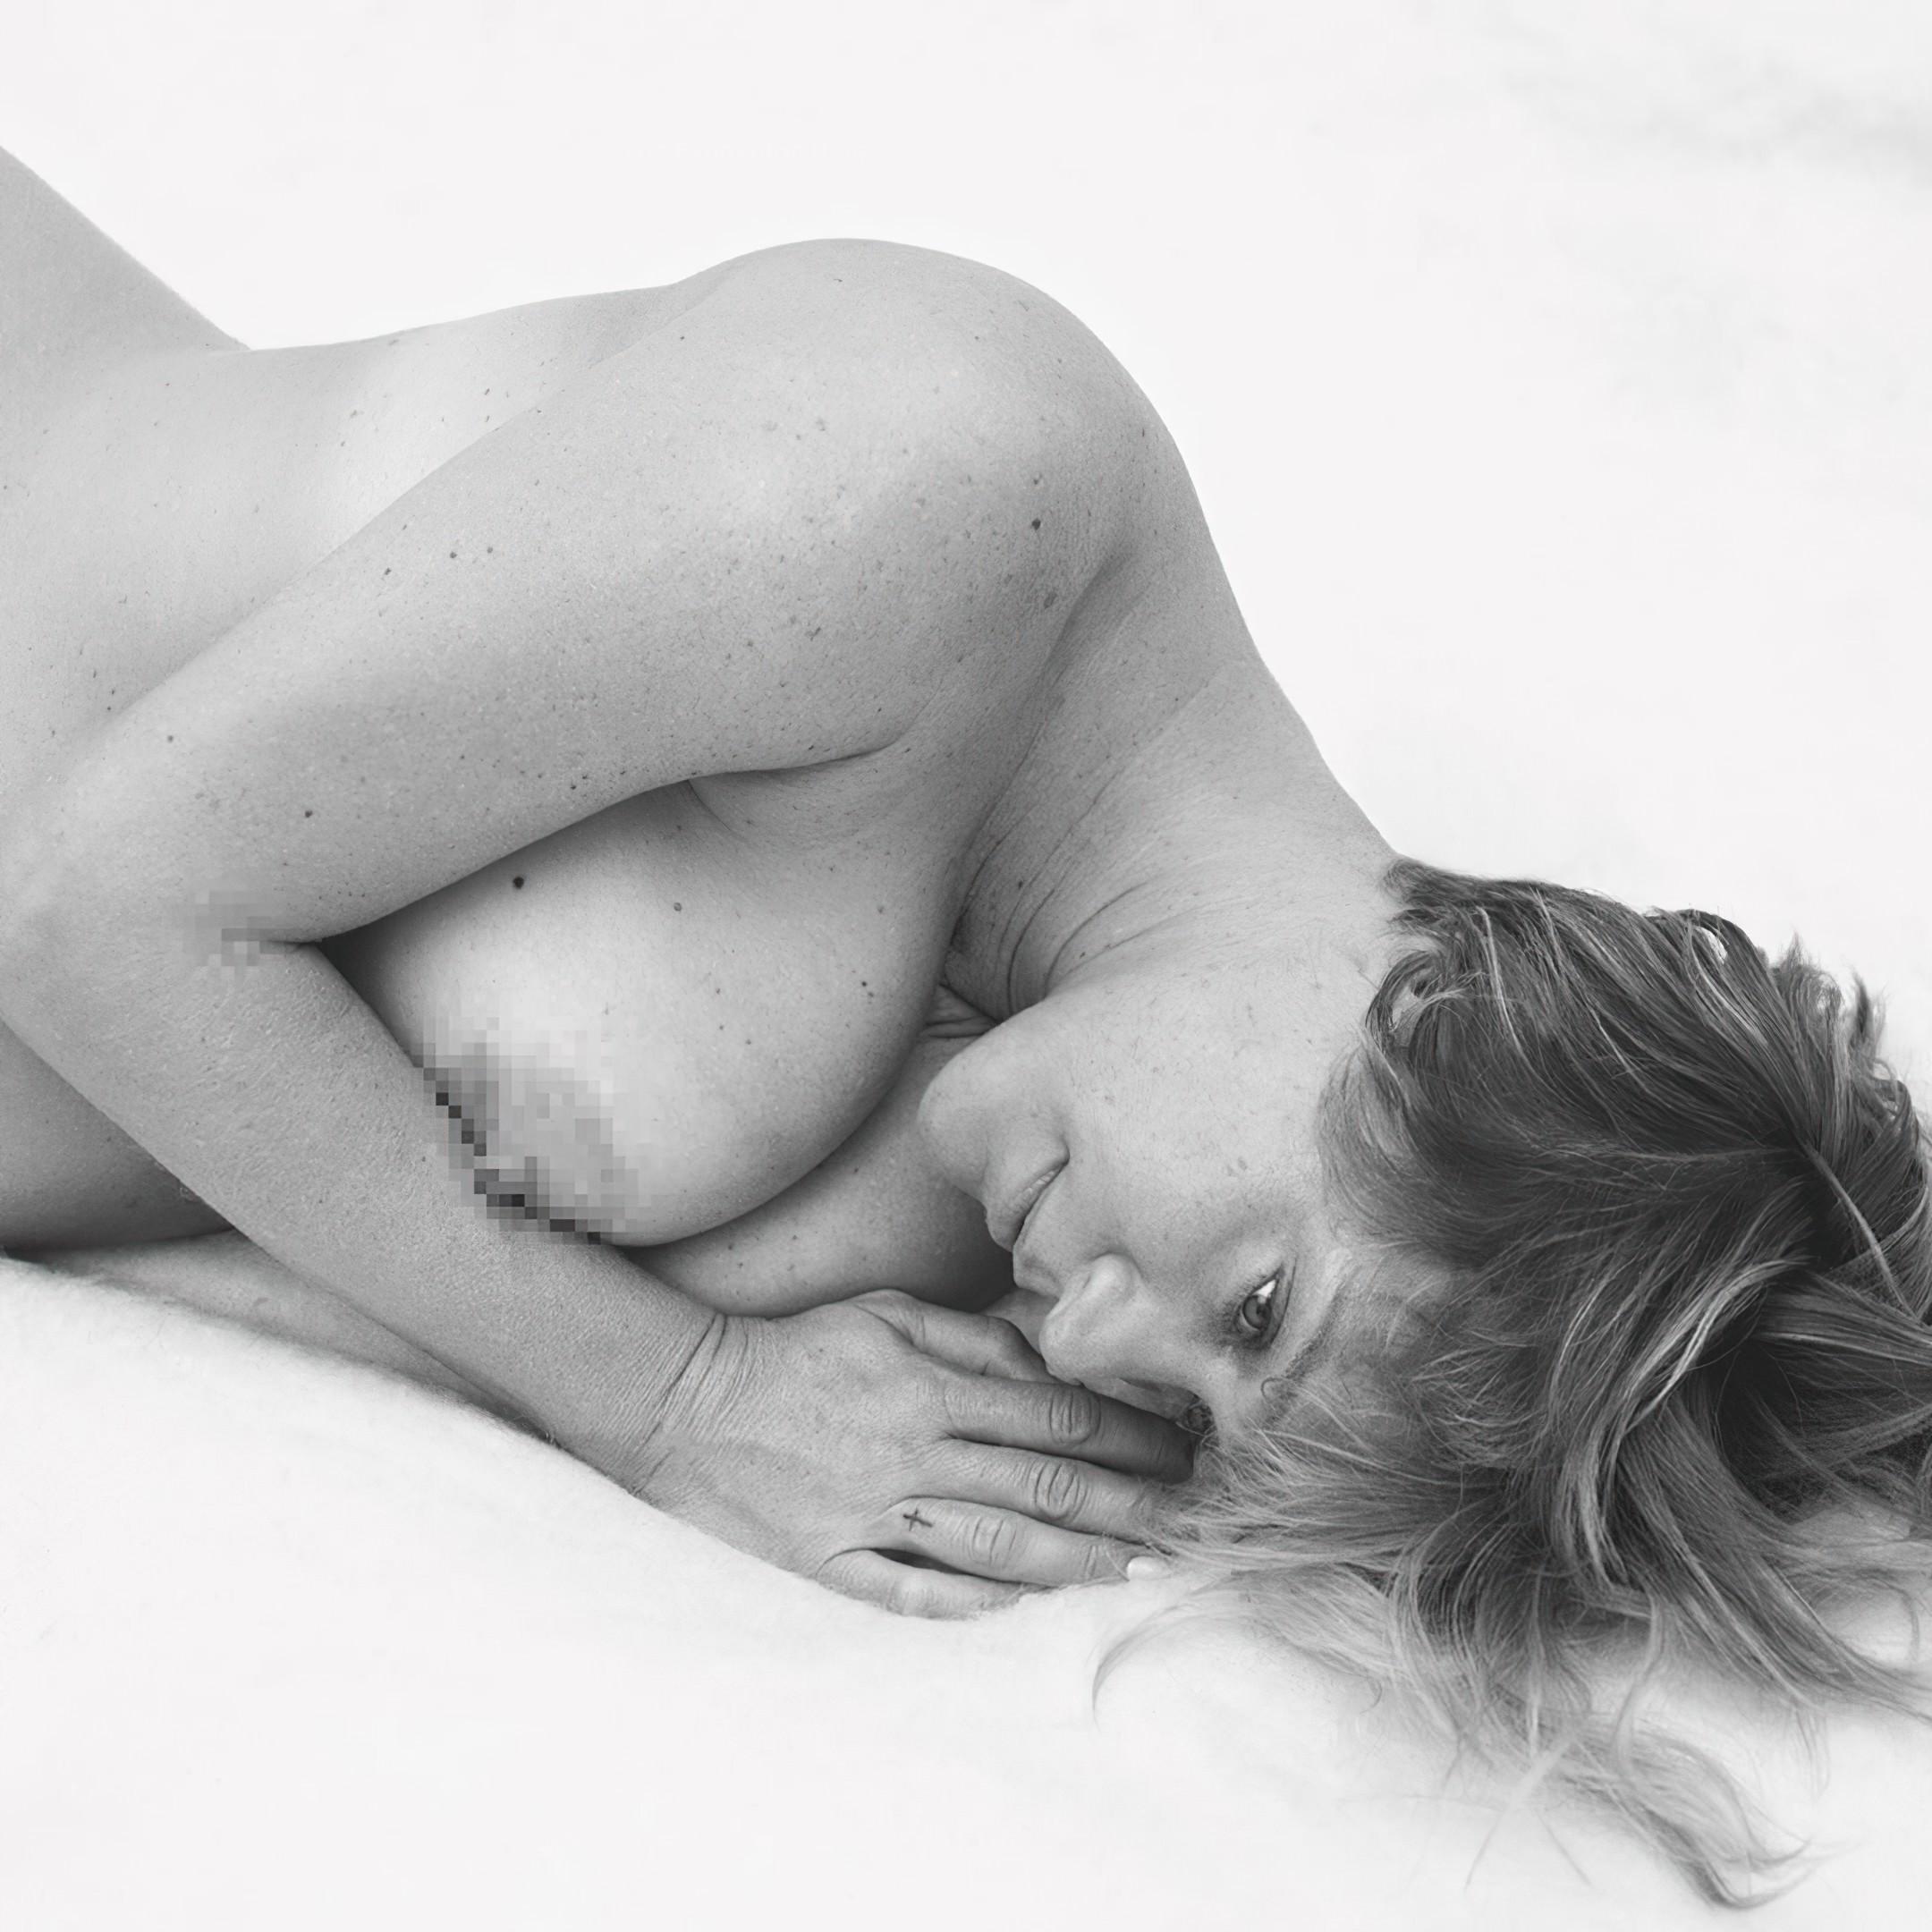 3 Chloe Sevigny Nude fappenings.com